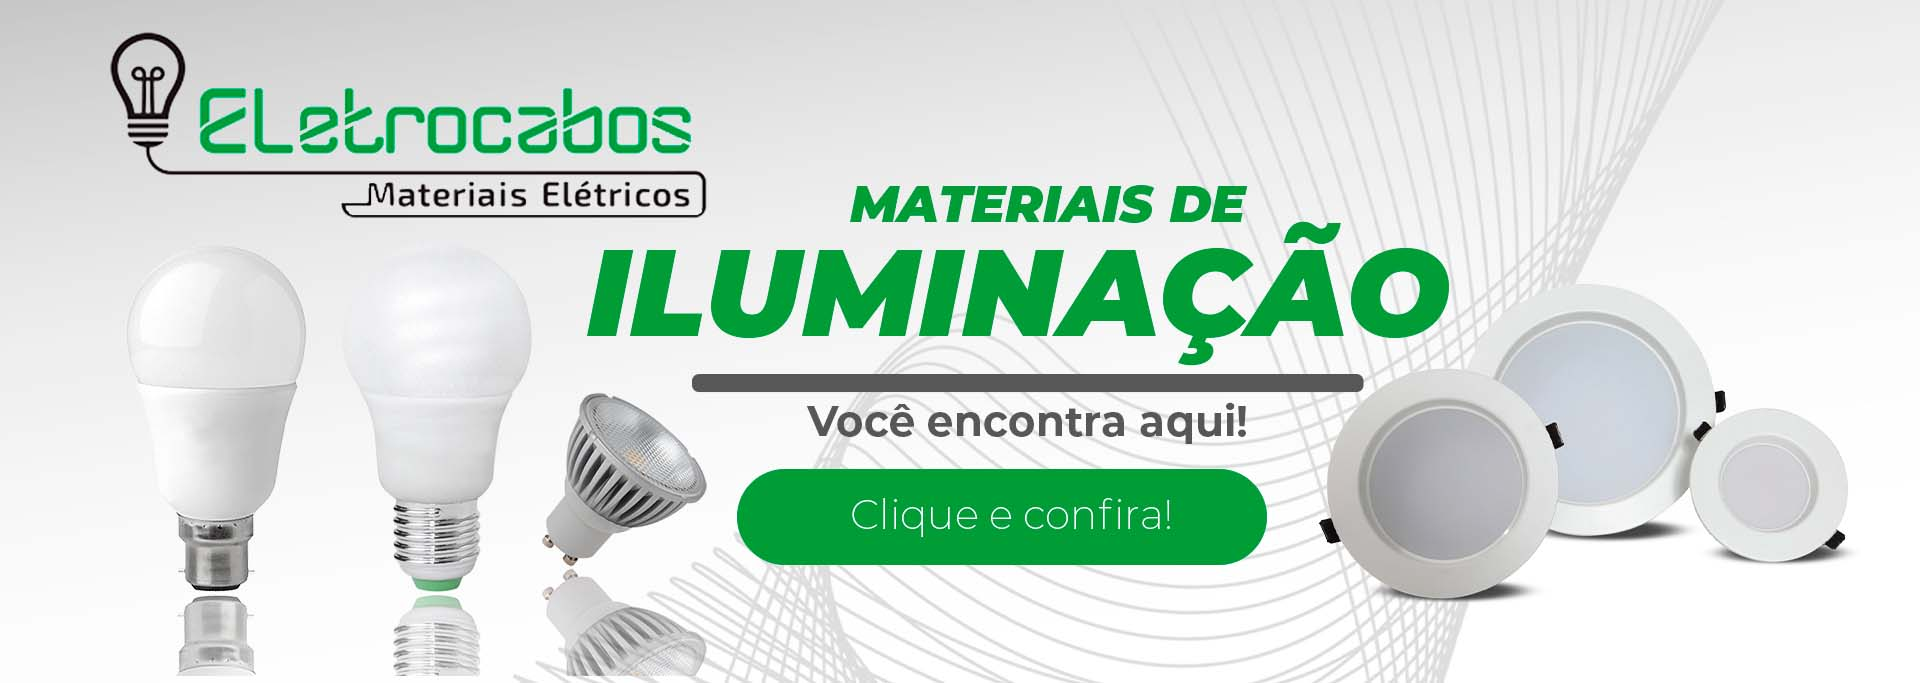 Eletrocabos-banner-3